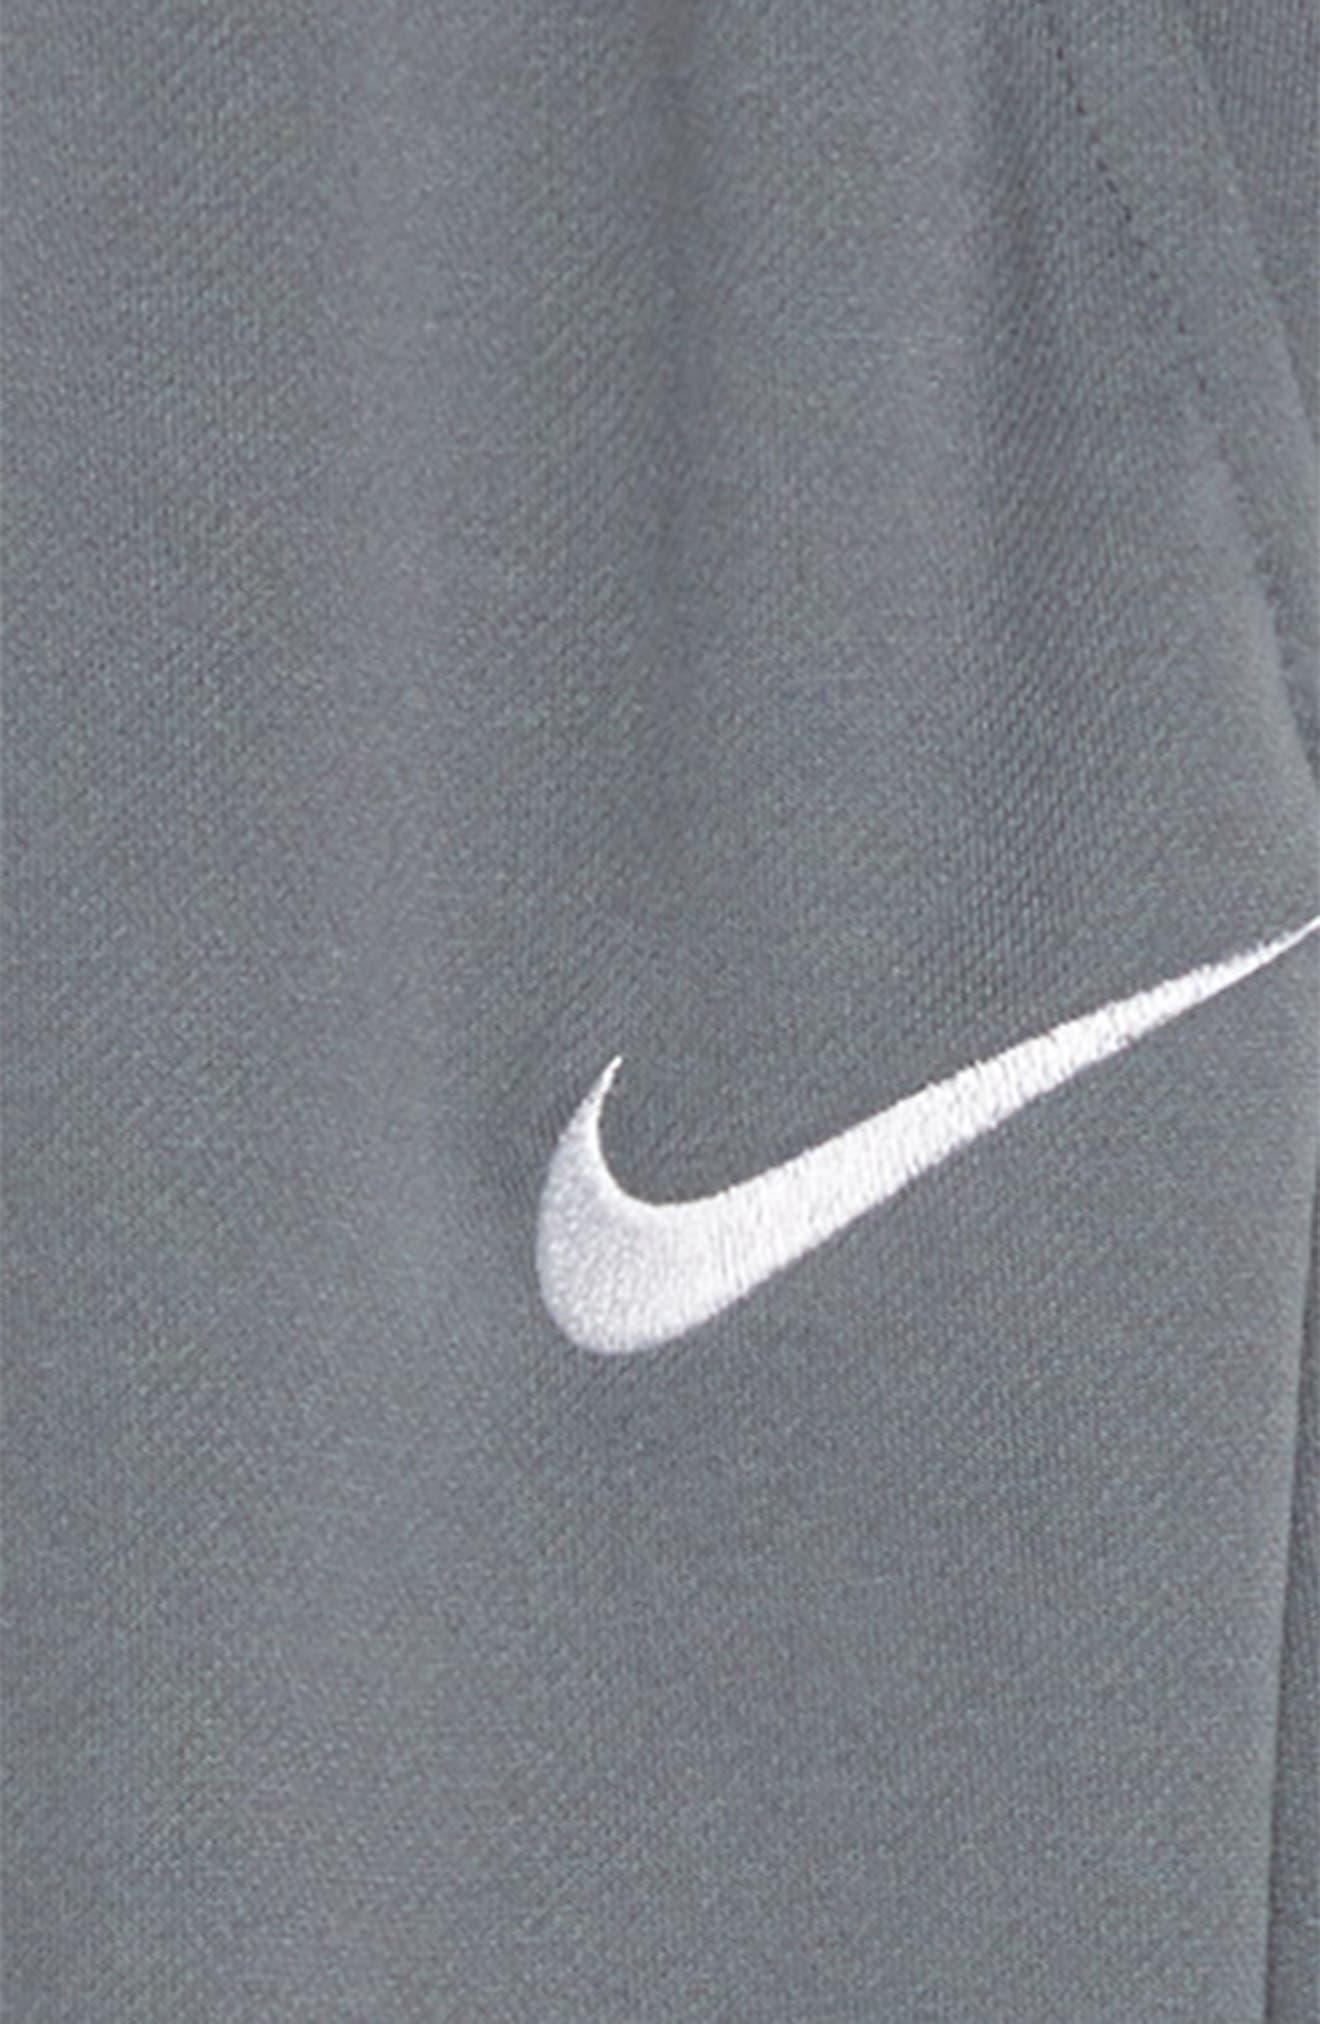 Dry Fleece Training Pants,                             Alternate thumbnail 2, color,                             Cool Grey/ White